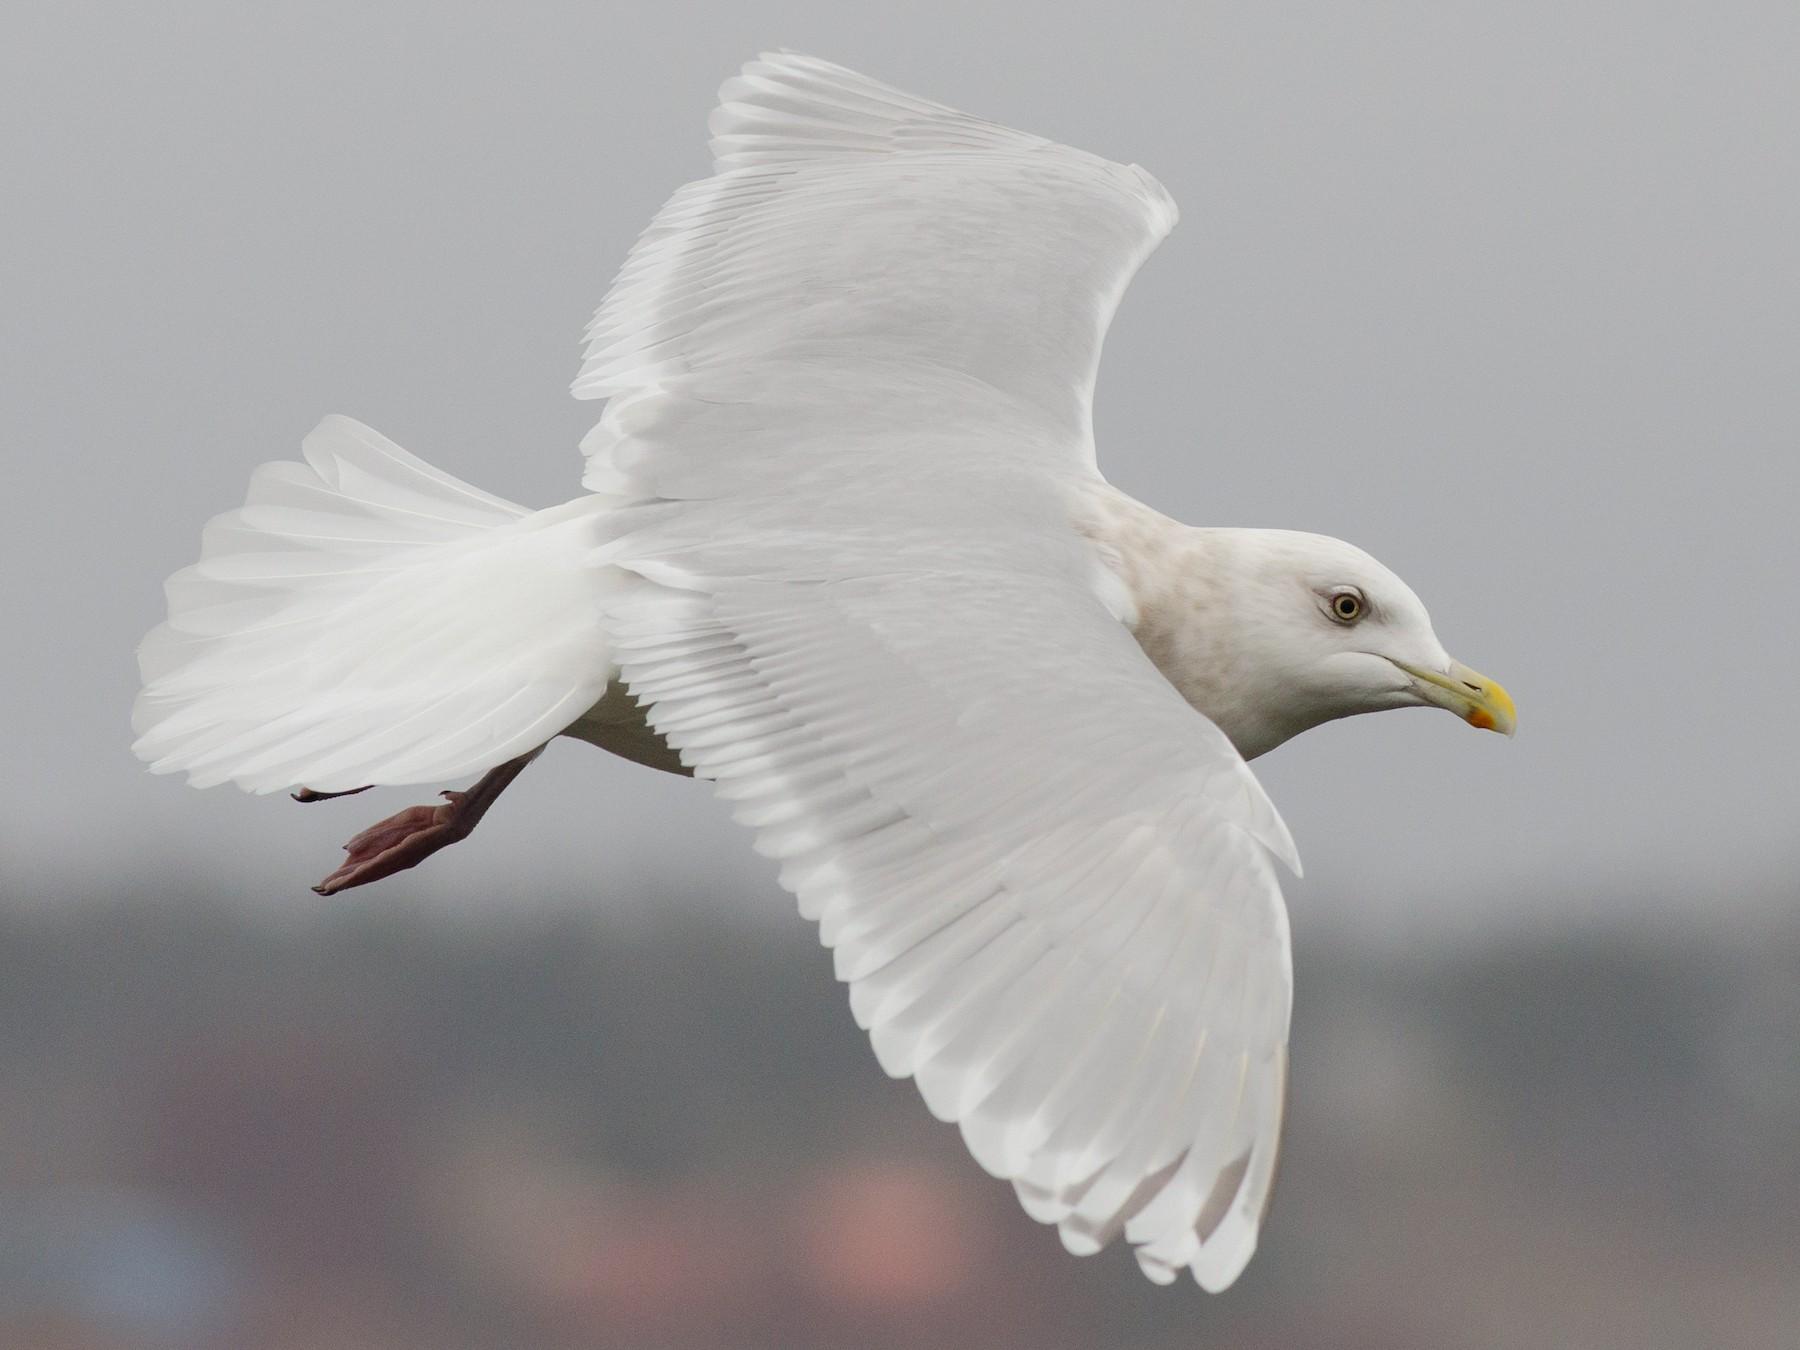 Iceland Gull - Alix d'Entremont